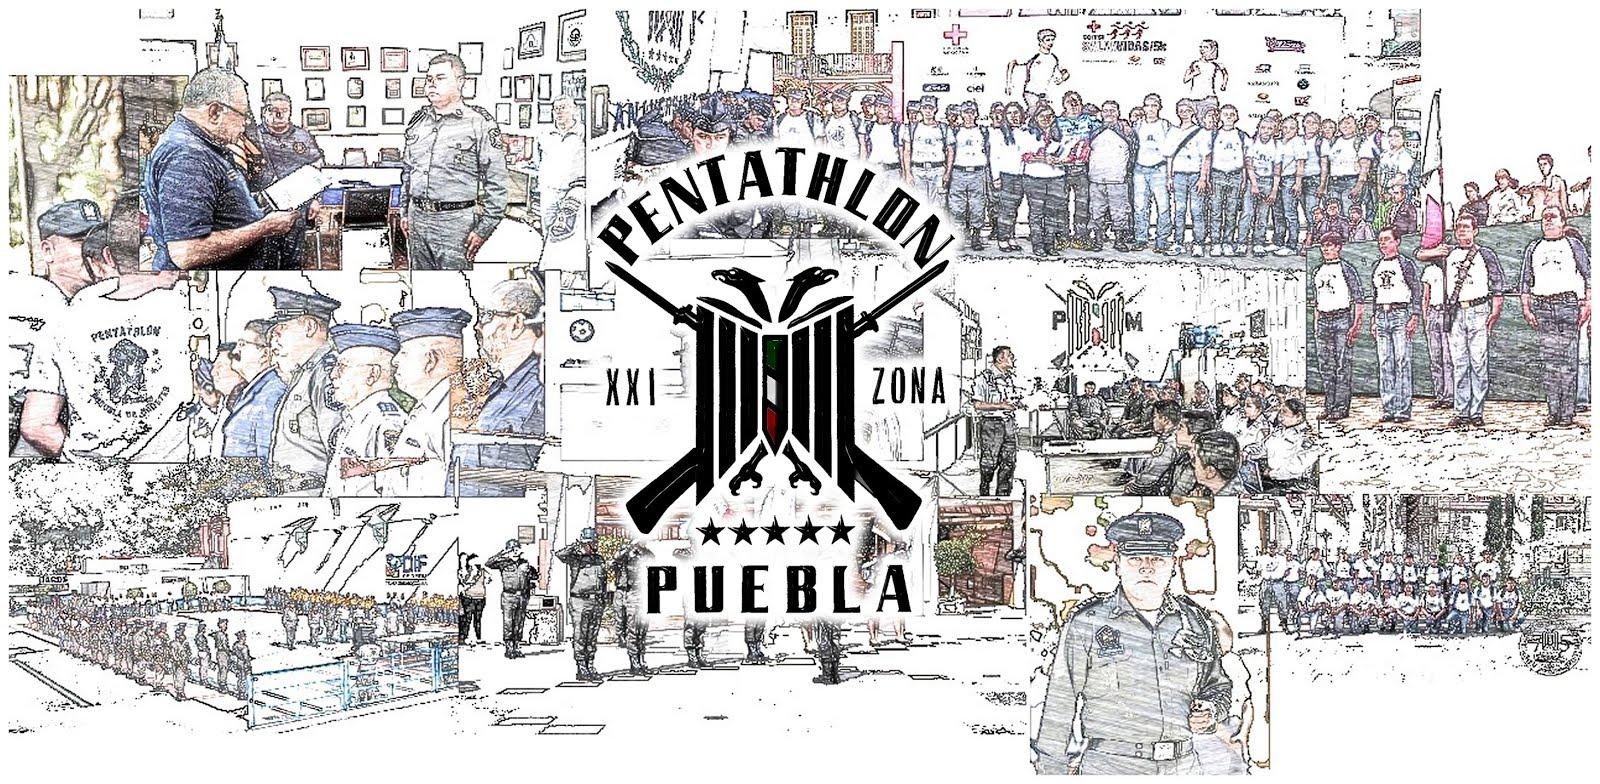 Pentathlón Deportivo Militarizado Universitario. XXI Zona Puebla